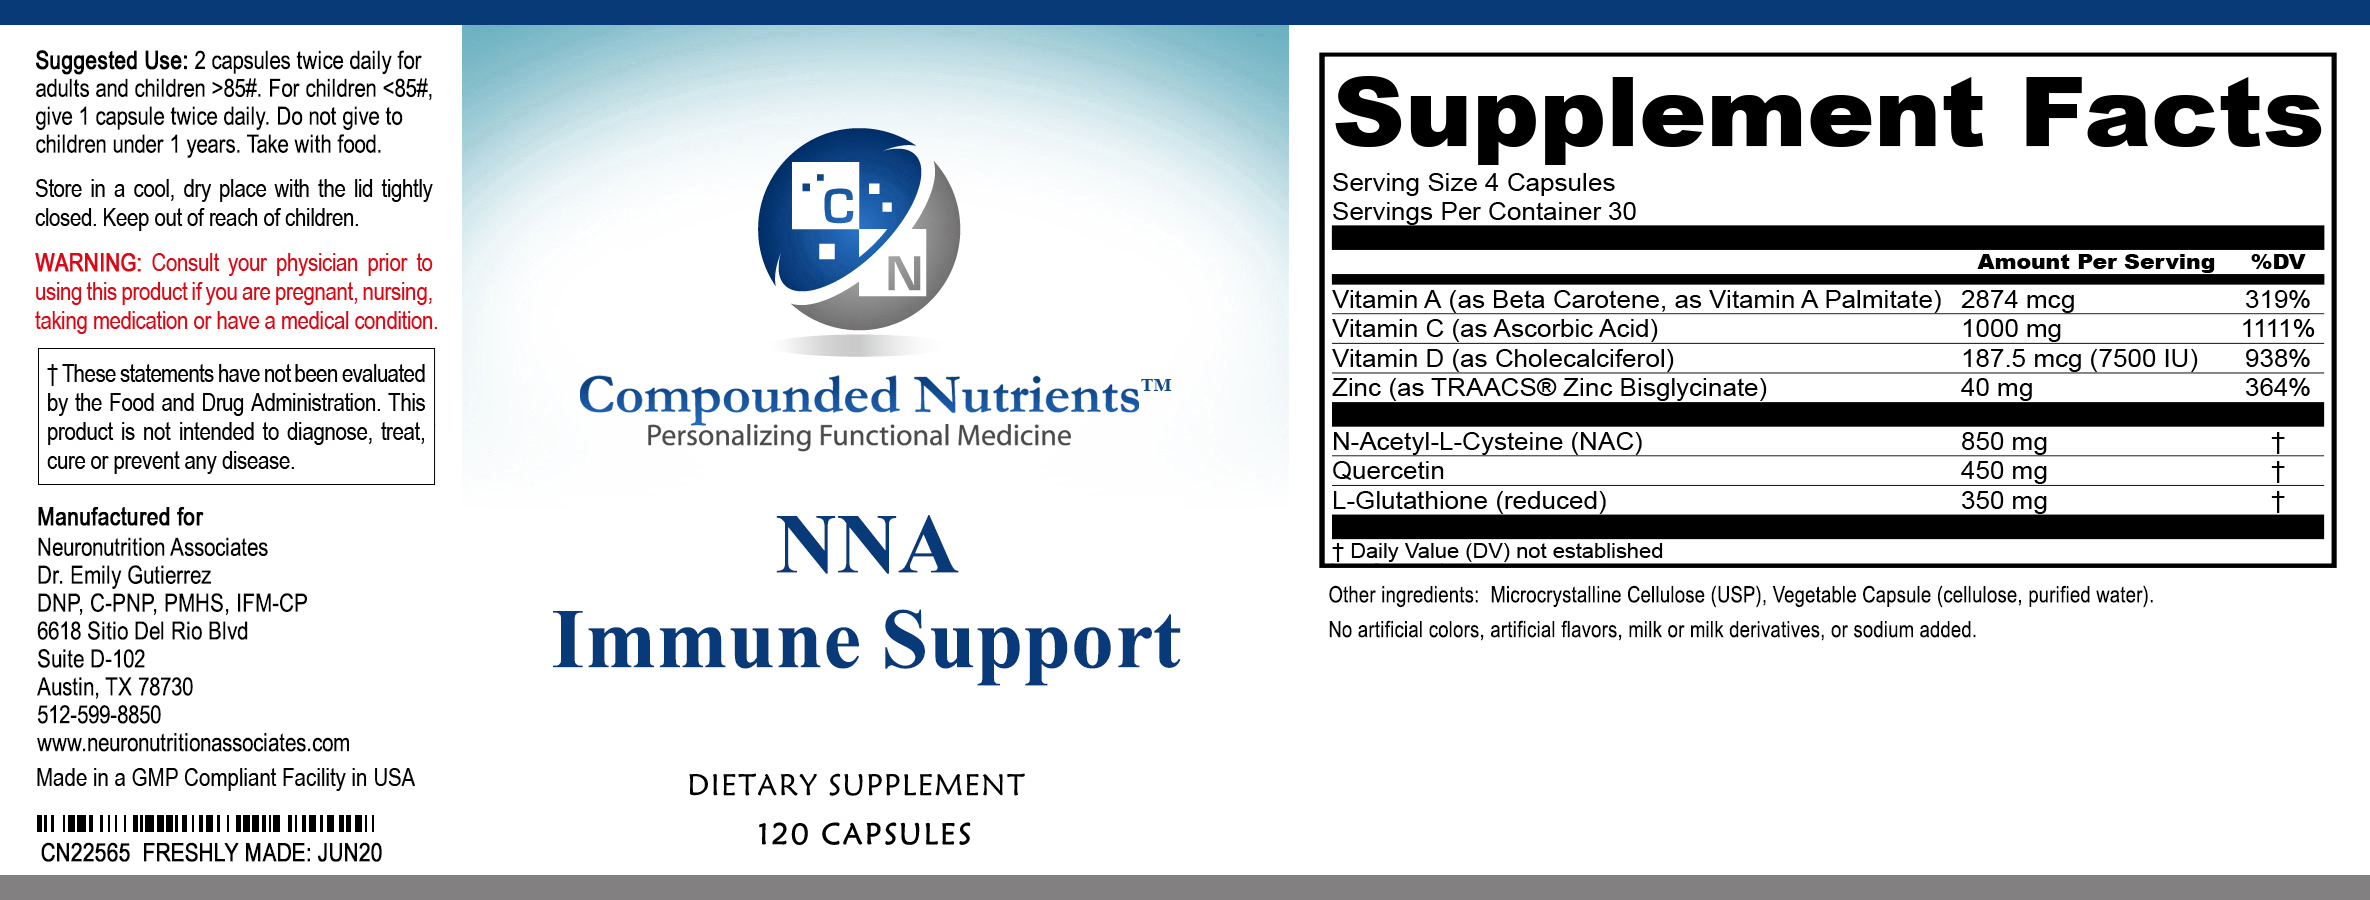 cn22565-nna-immune-support-fm-jun20.jpg